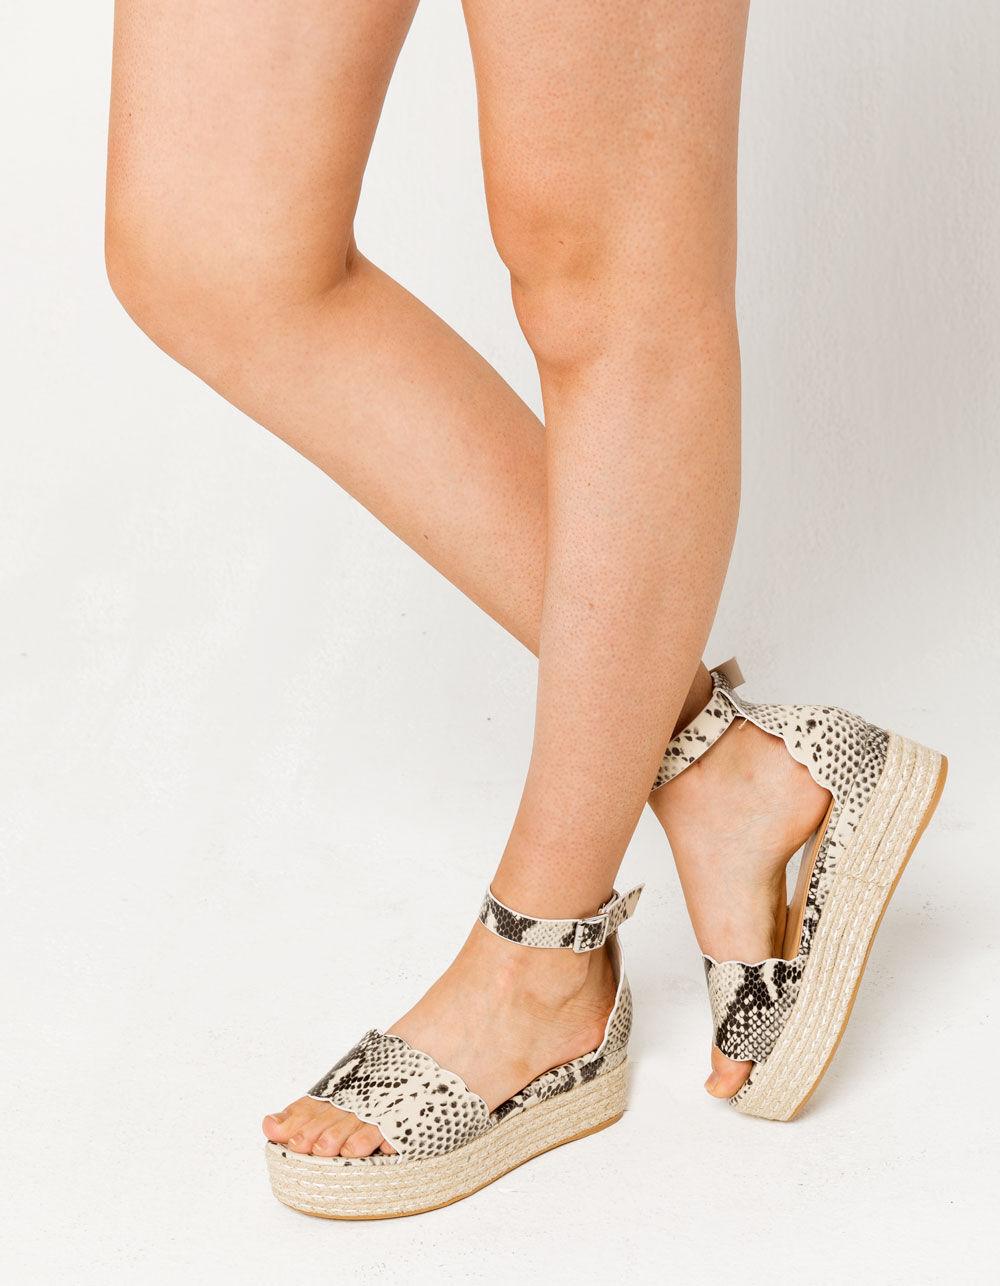 BAMBOO Scallop Espadrille Snake Platform Sandals